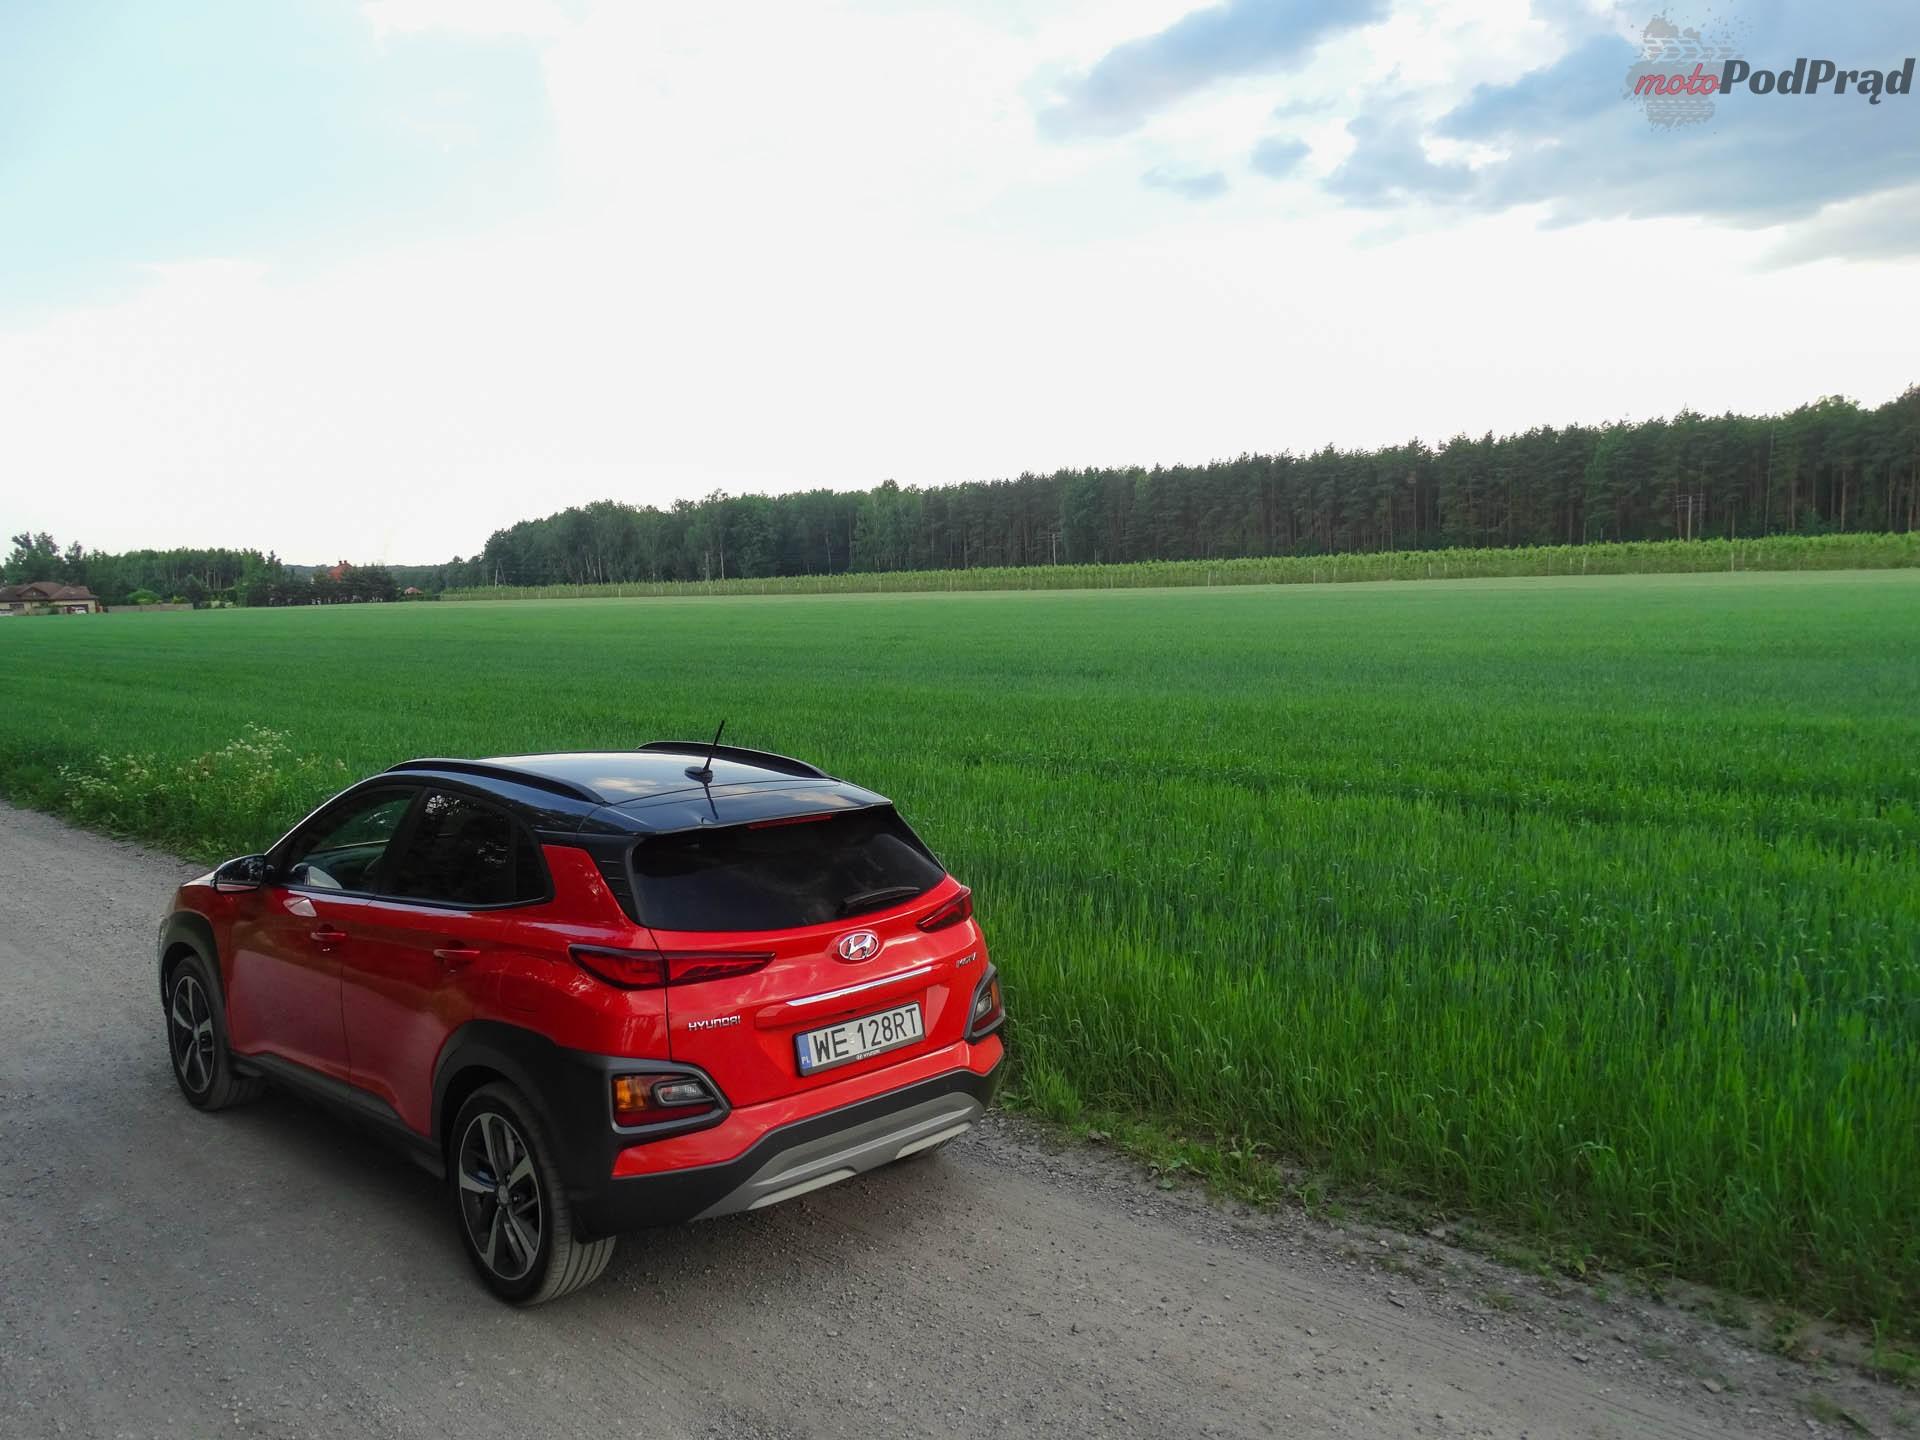 Hyundai Kona 6 Porównanie: Hyundai Kona 1.0 kontra Seat Arona 1.0